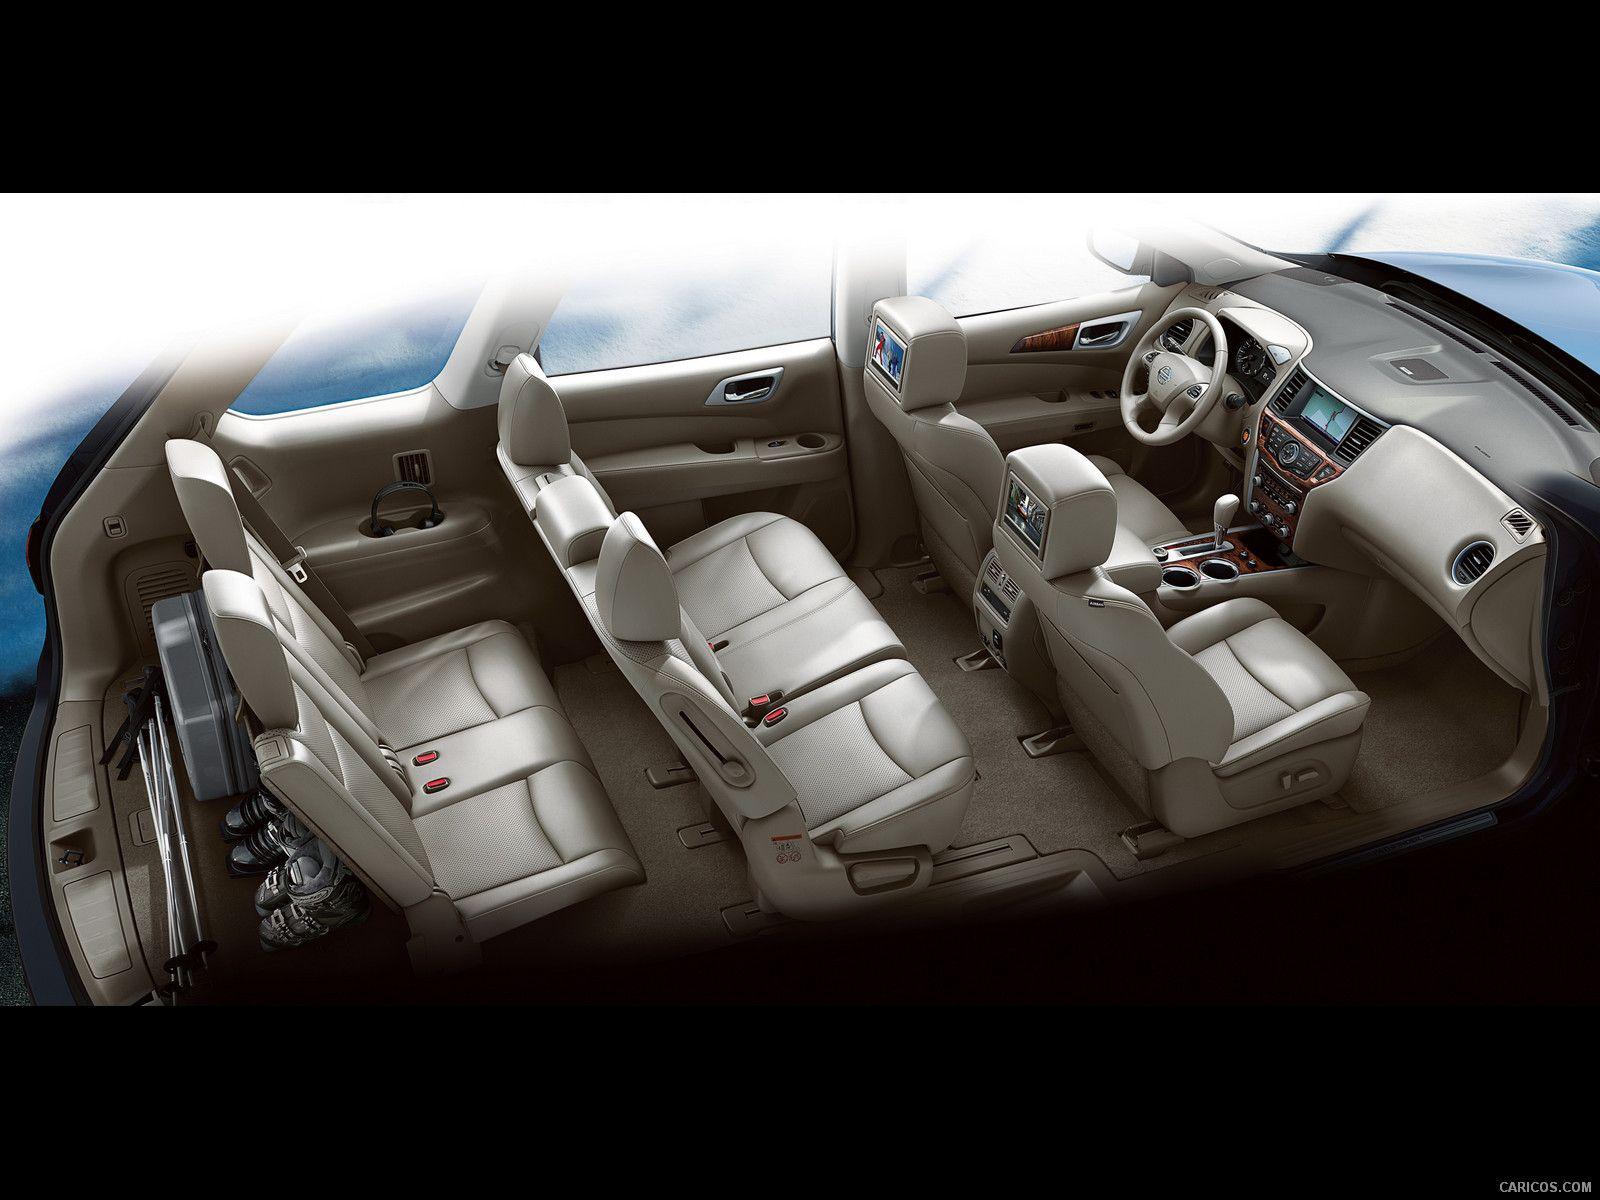 2022 Nissan Pathfinder Key, 2012 Nissan Pathfinder Concept Wallpaper Nissan Pathfinder Honda Pilot Nissan